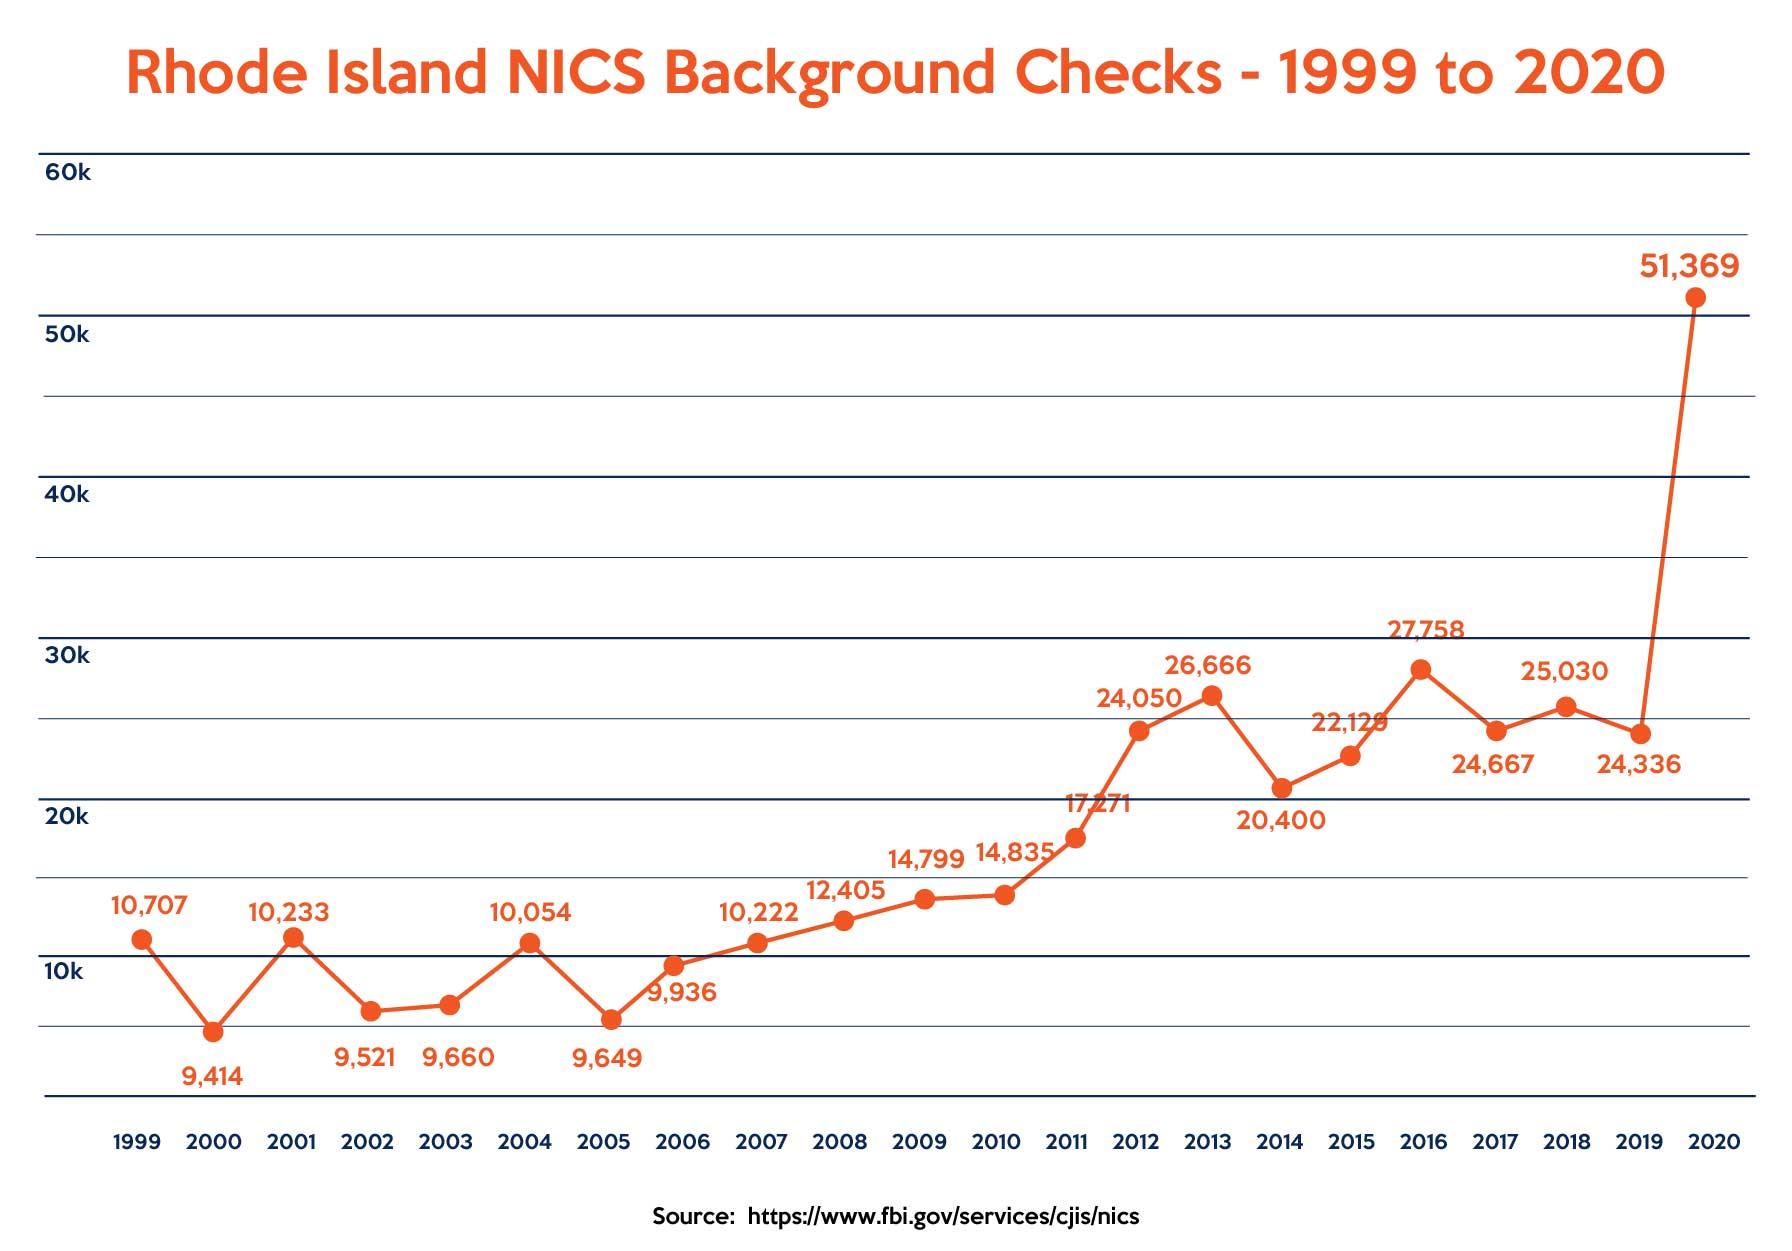 NICS Background checks - Rhode Island 1999-2020